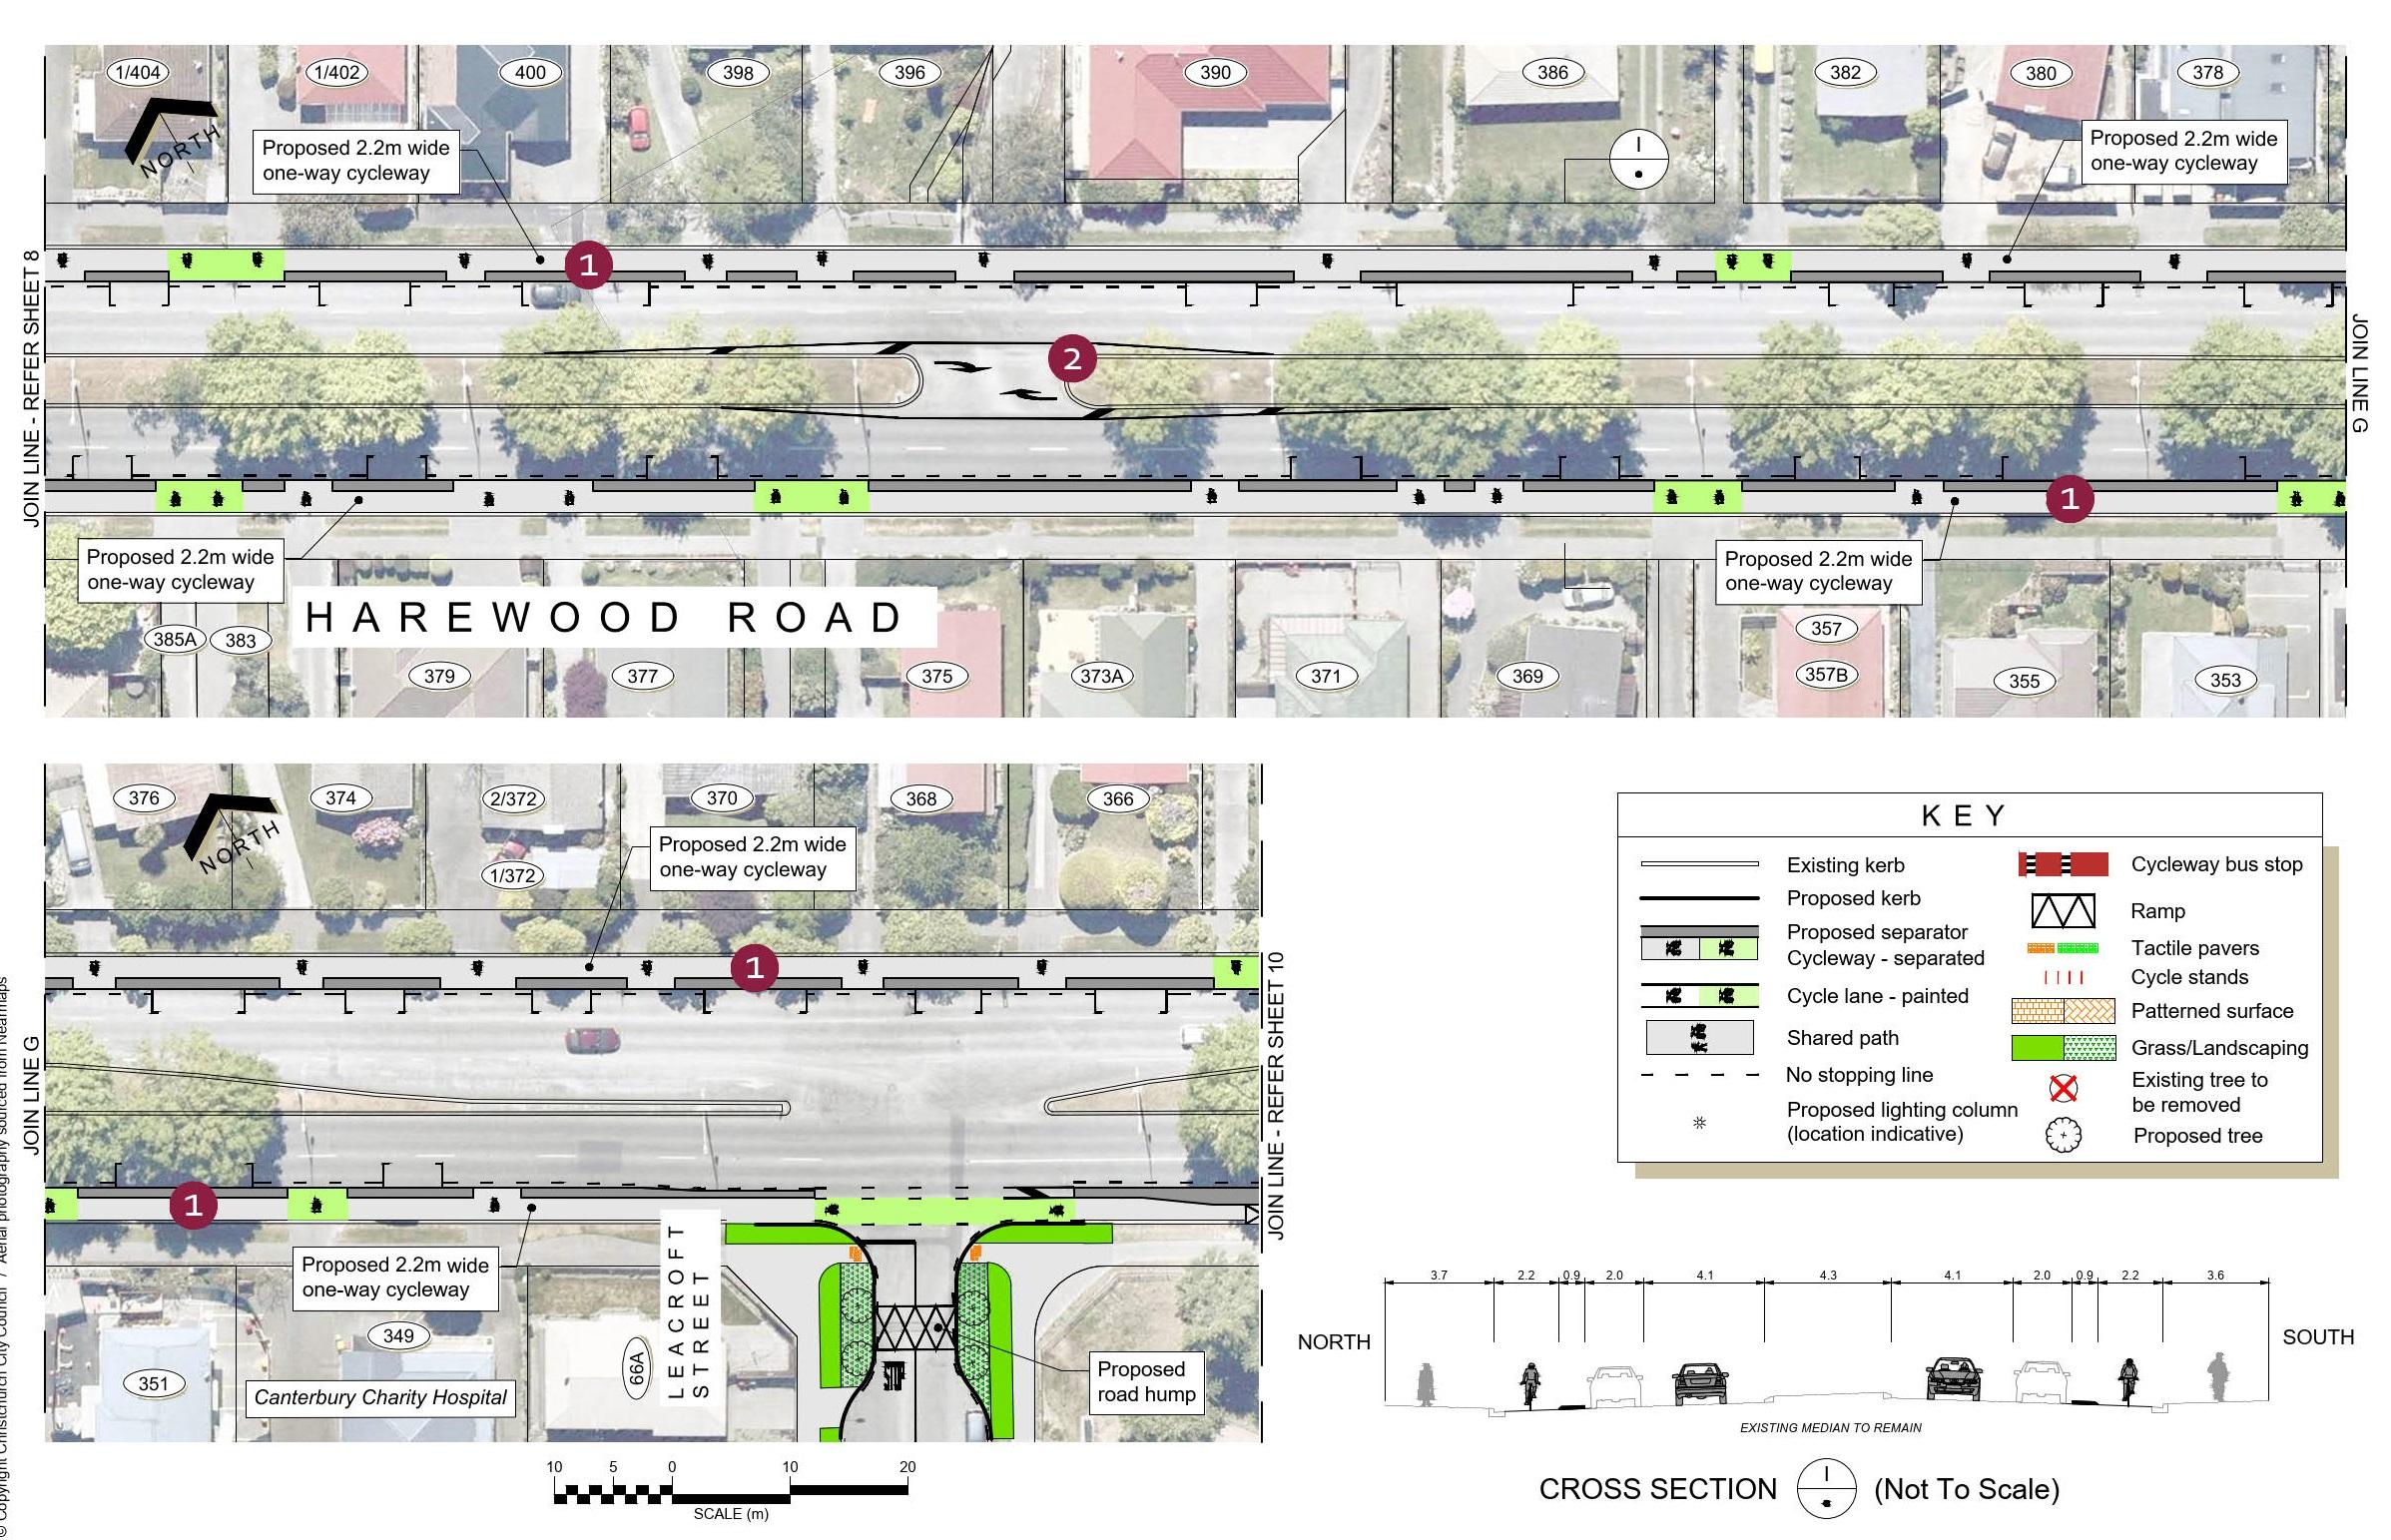 Plan 9 - 404 to 364 Harewood Road